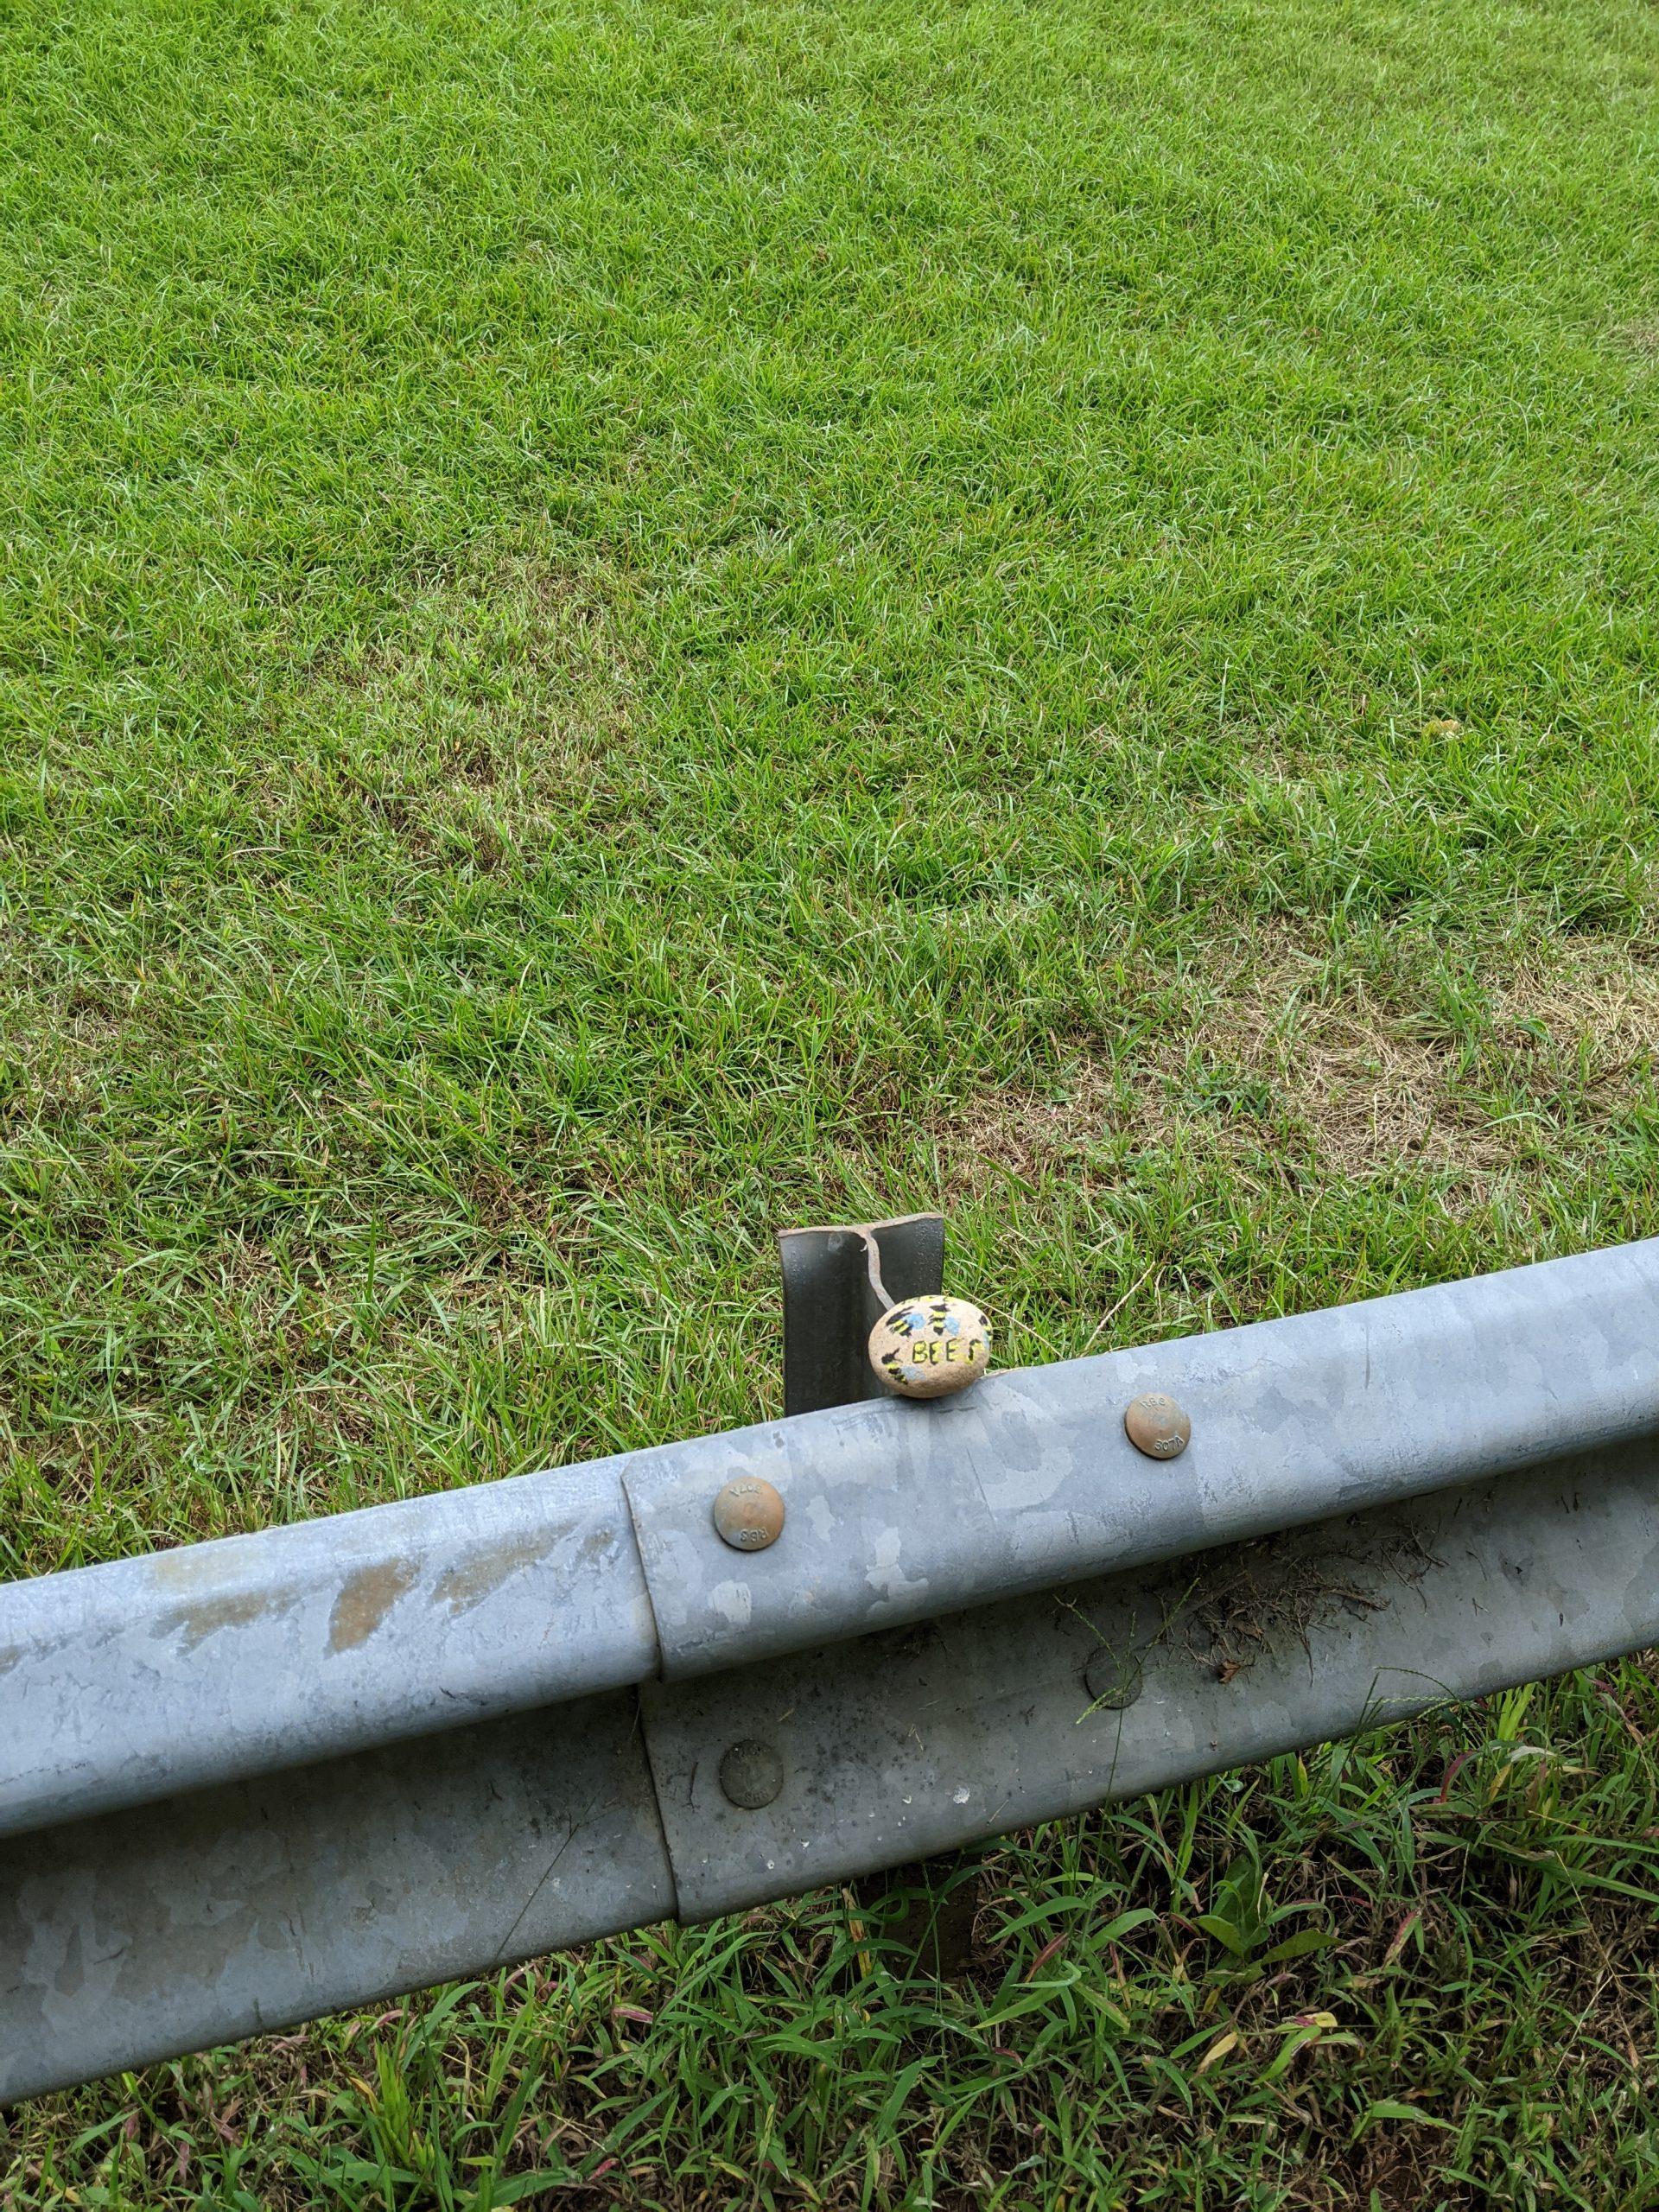 A bee rock on a guard rail